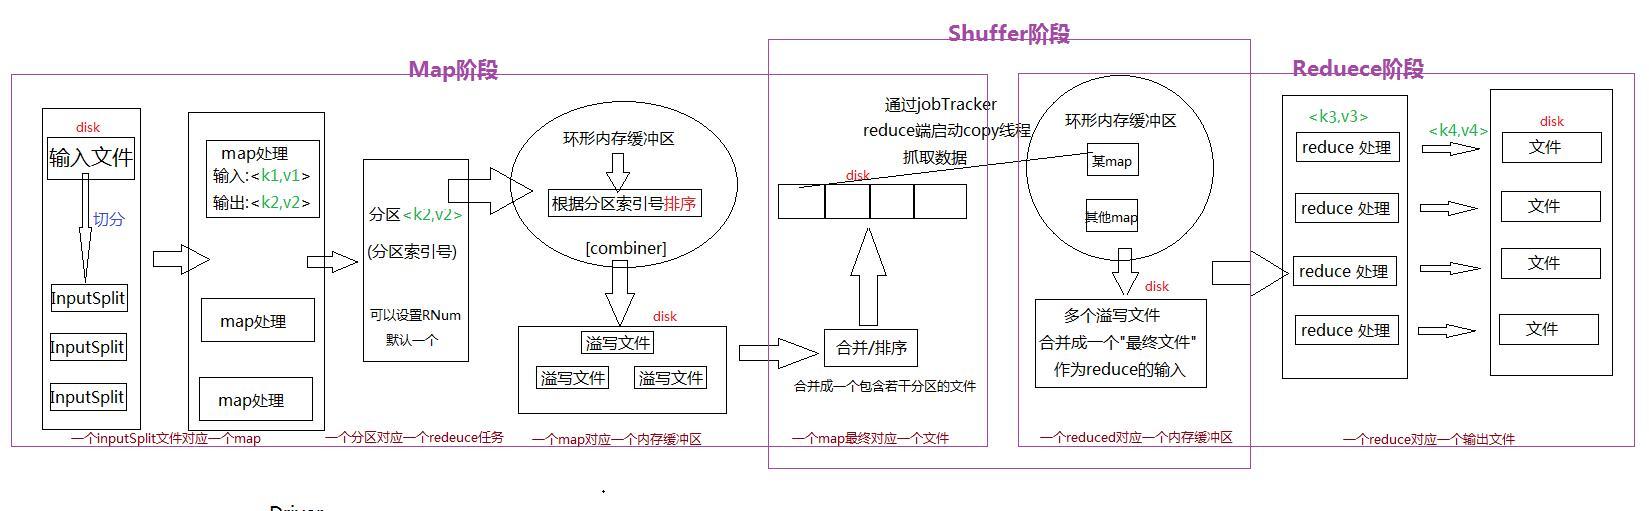 MapReduce详细的执行流程